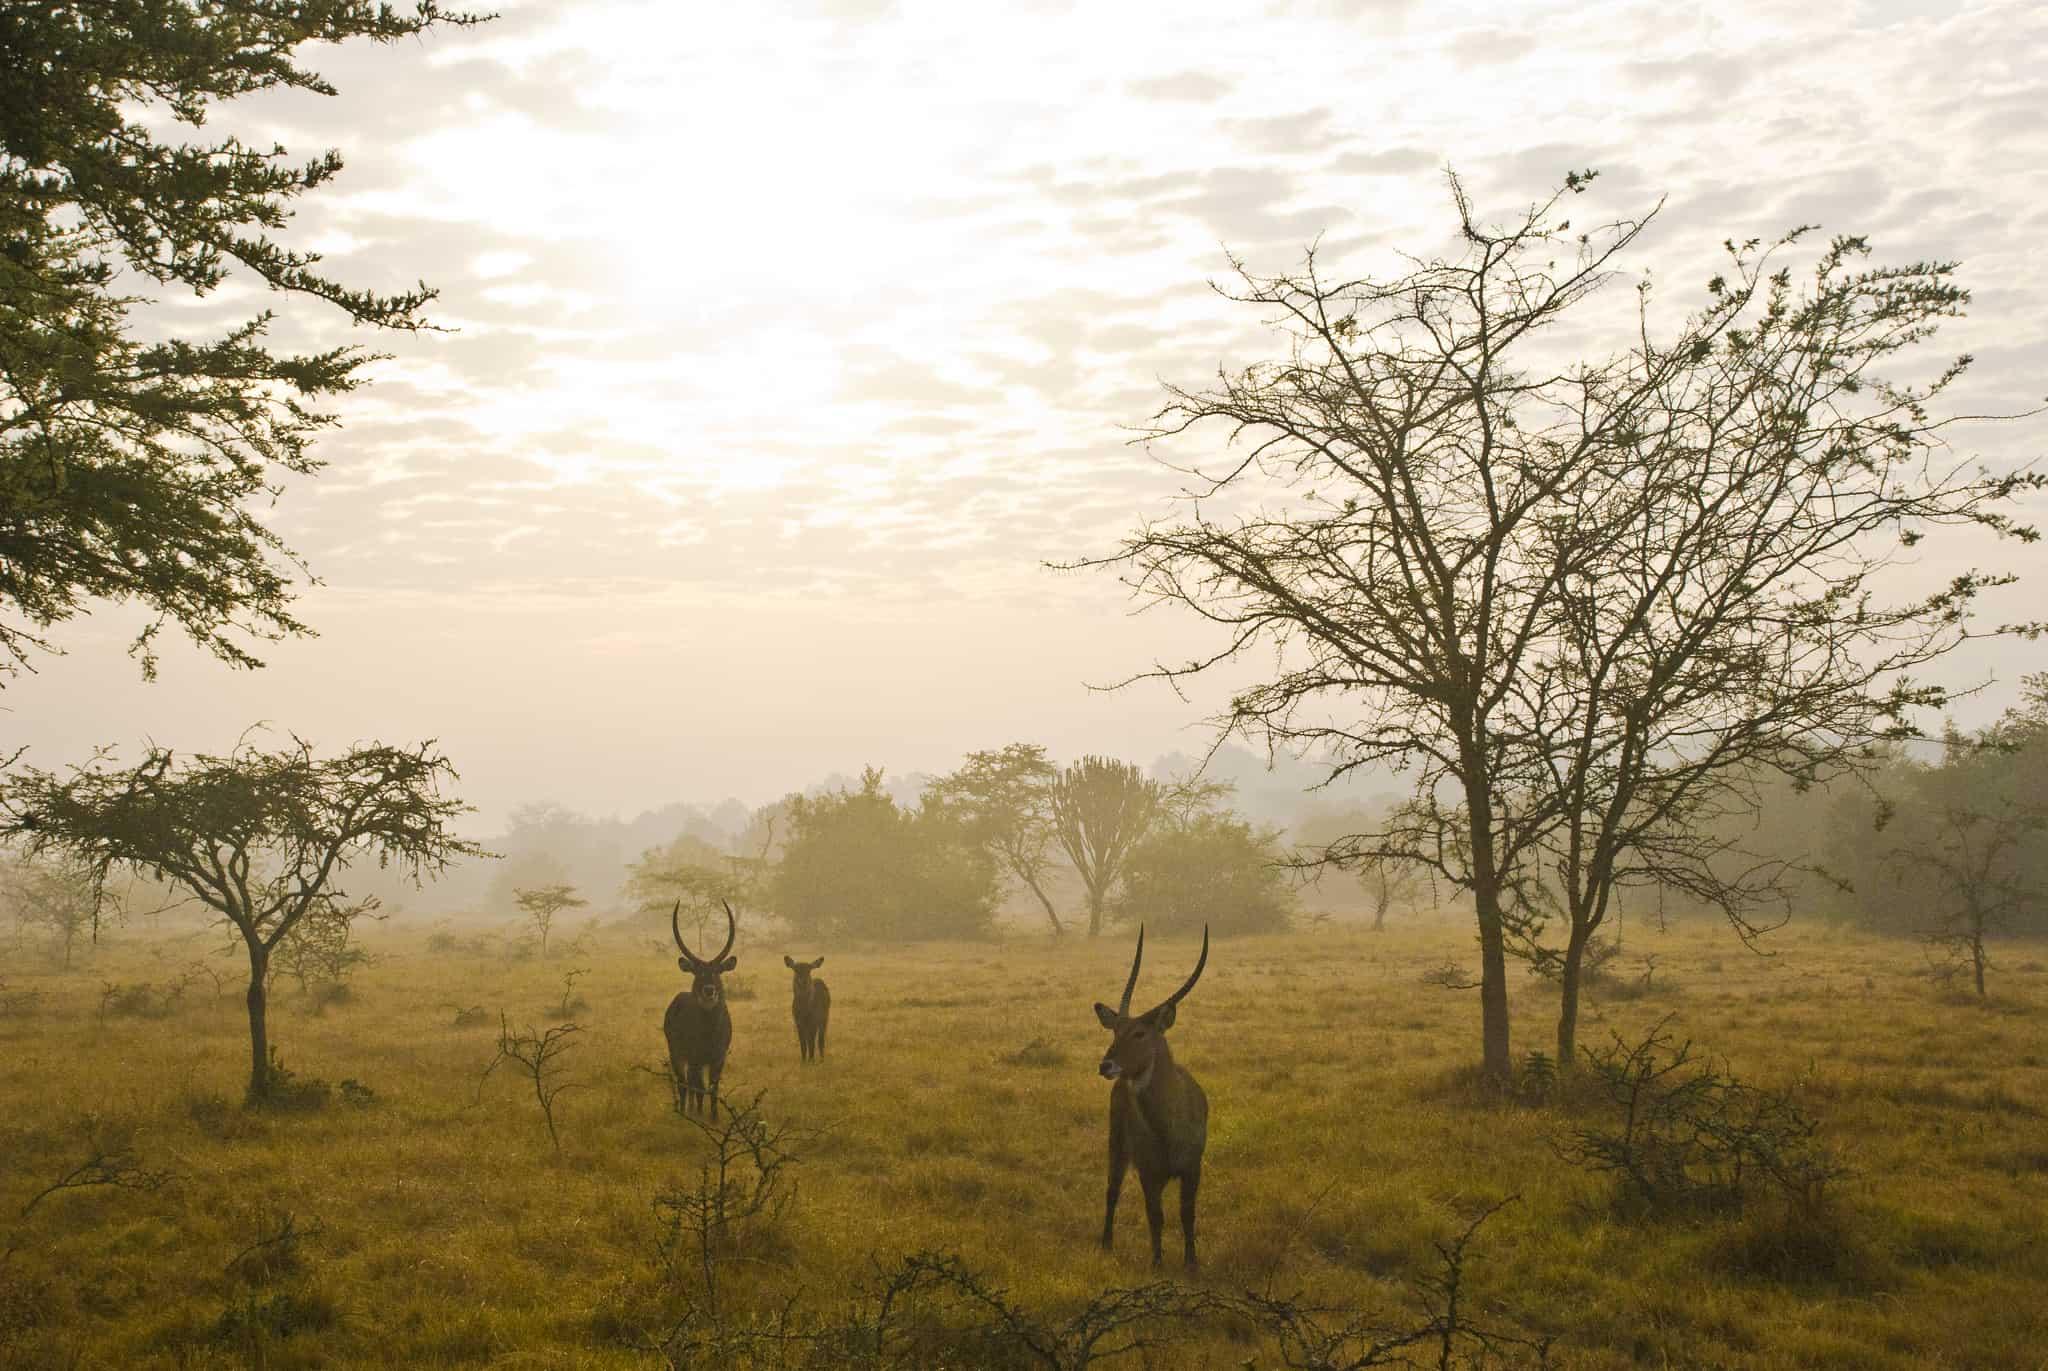 Uganda Deluxe Safari - Day 3